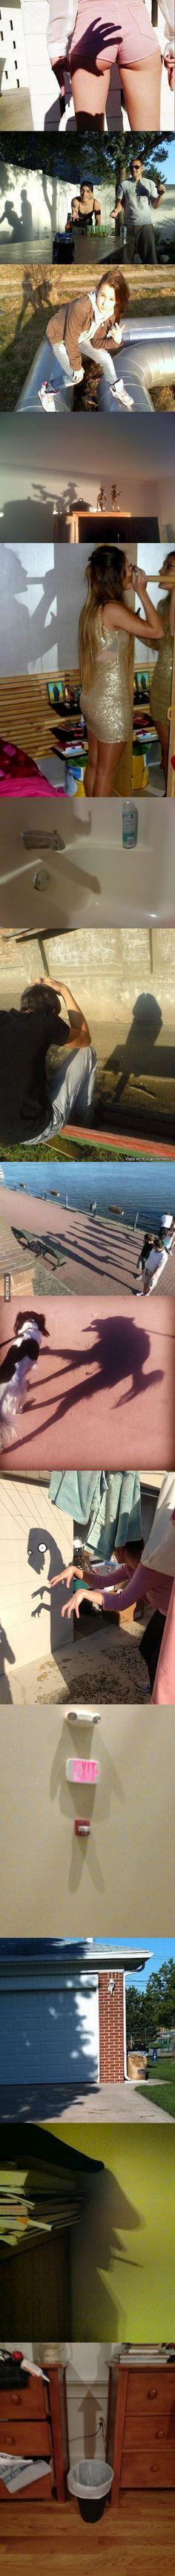 We work in secret, we exist in shadows...